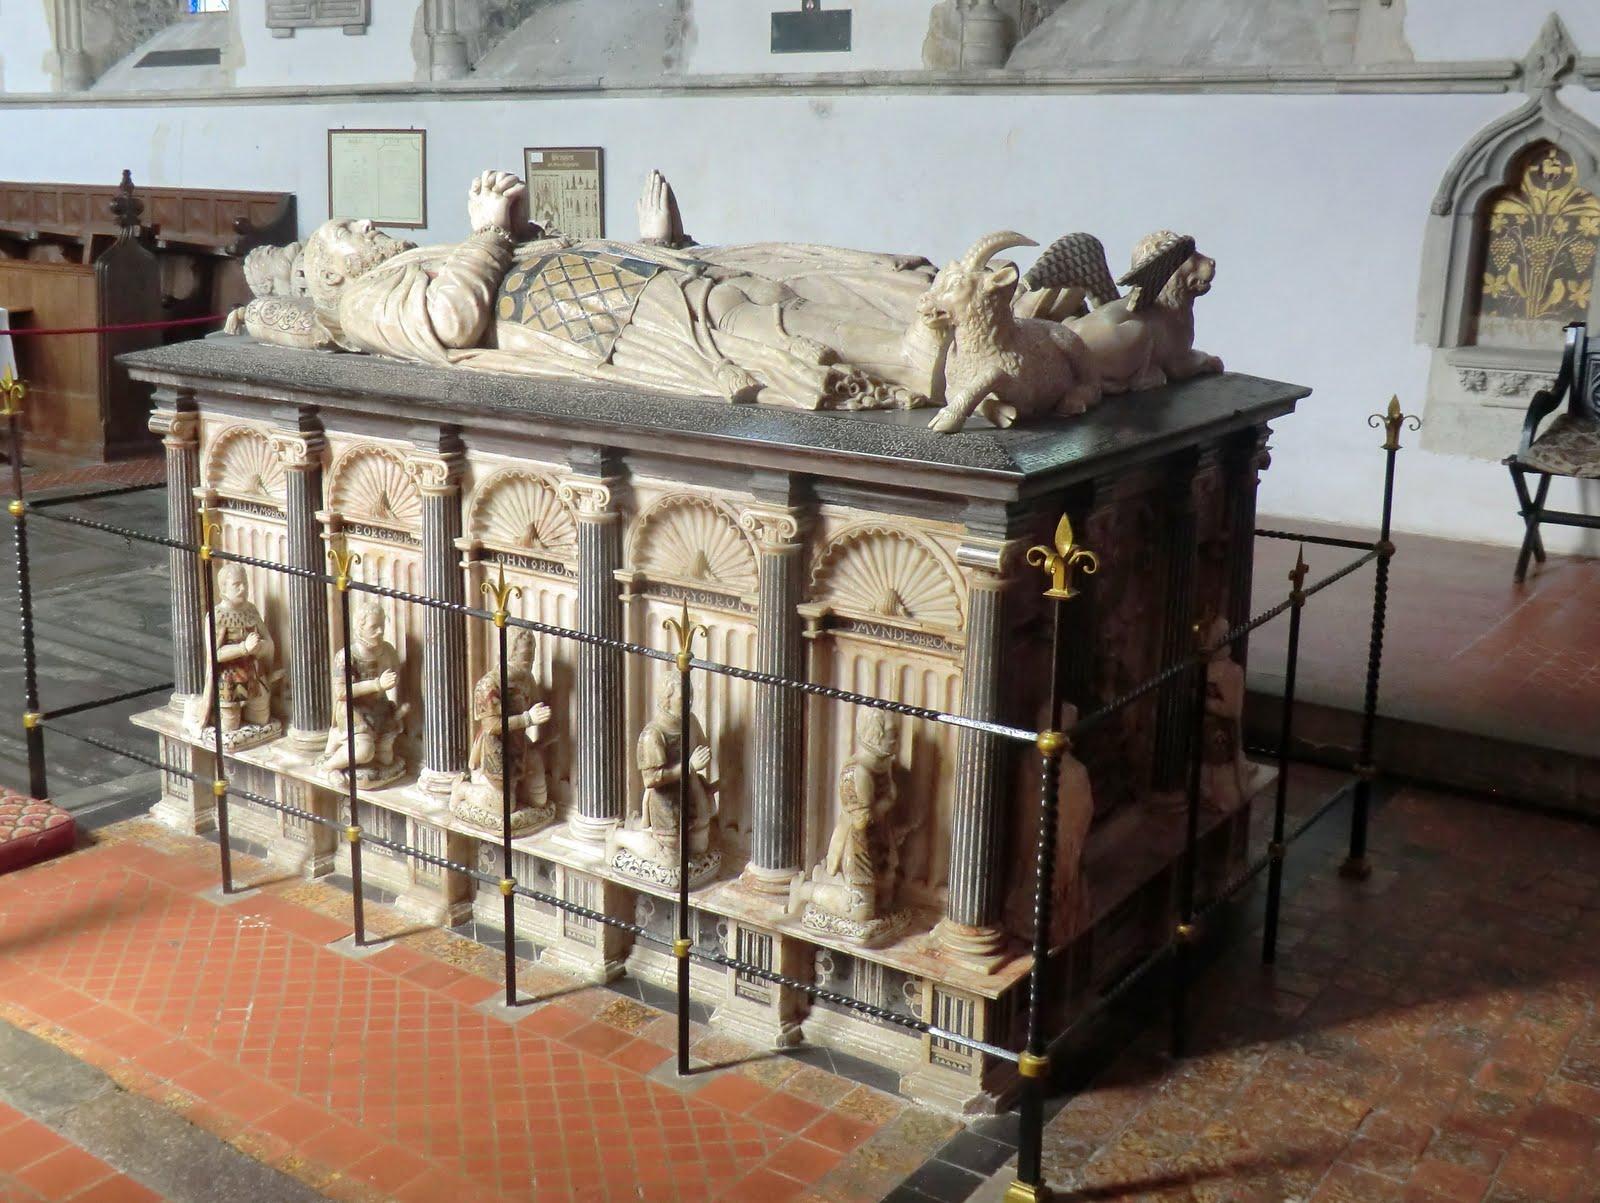 CIMG1928 Brooke Tomb, Cobham church